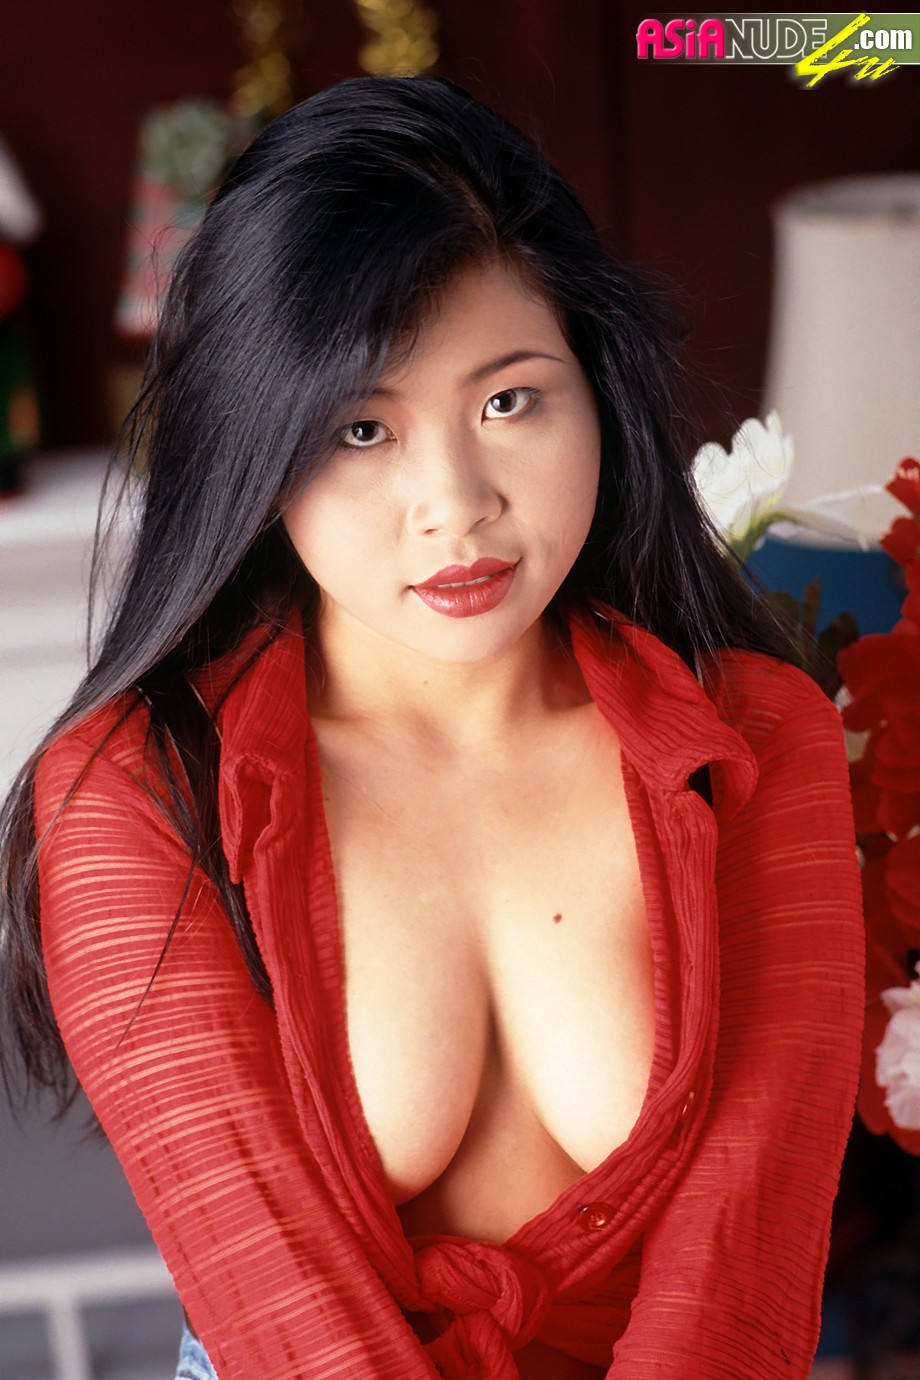 Cindy at asian 4 you